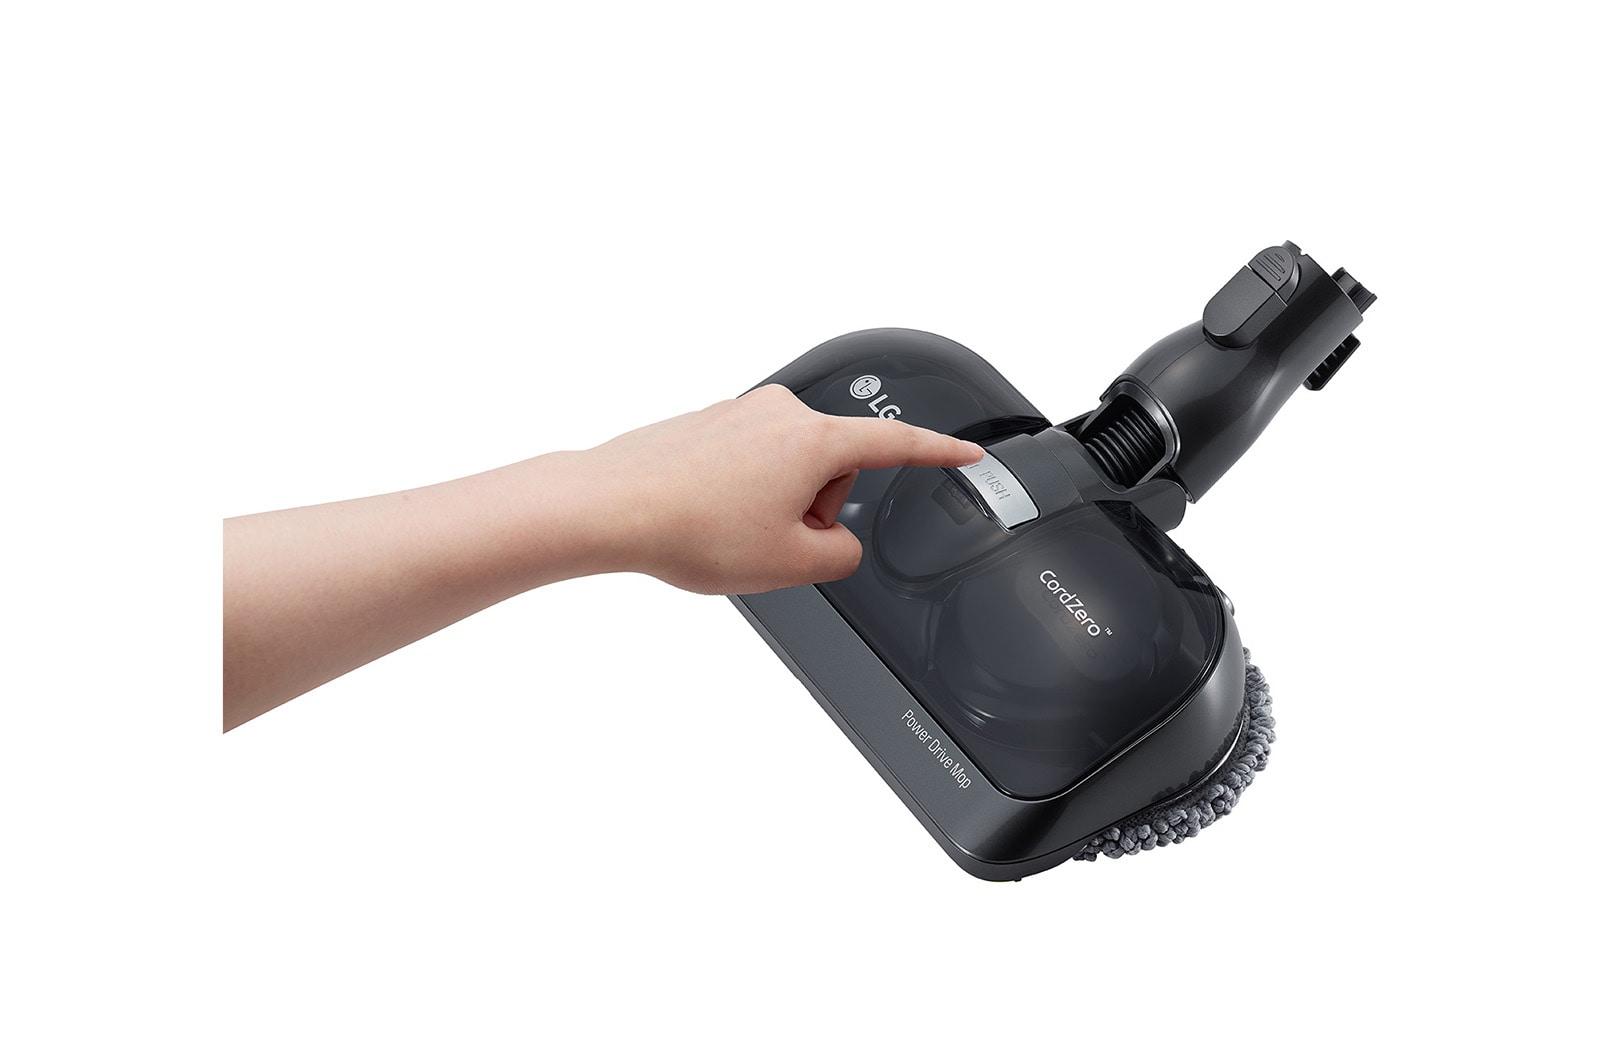 LG CordZero A9ULTIMATE | Cordless Handheld Stick Vacuum